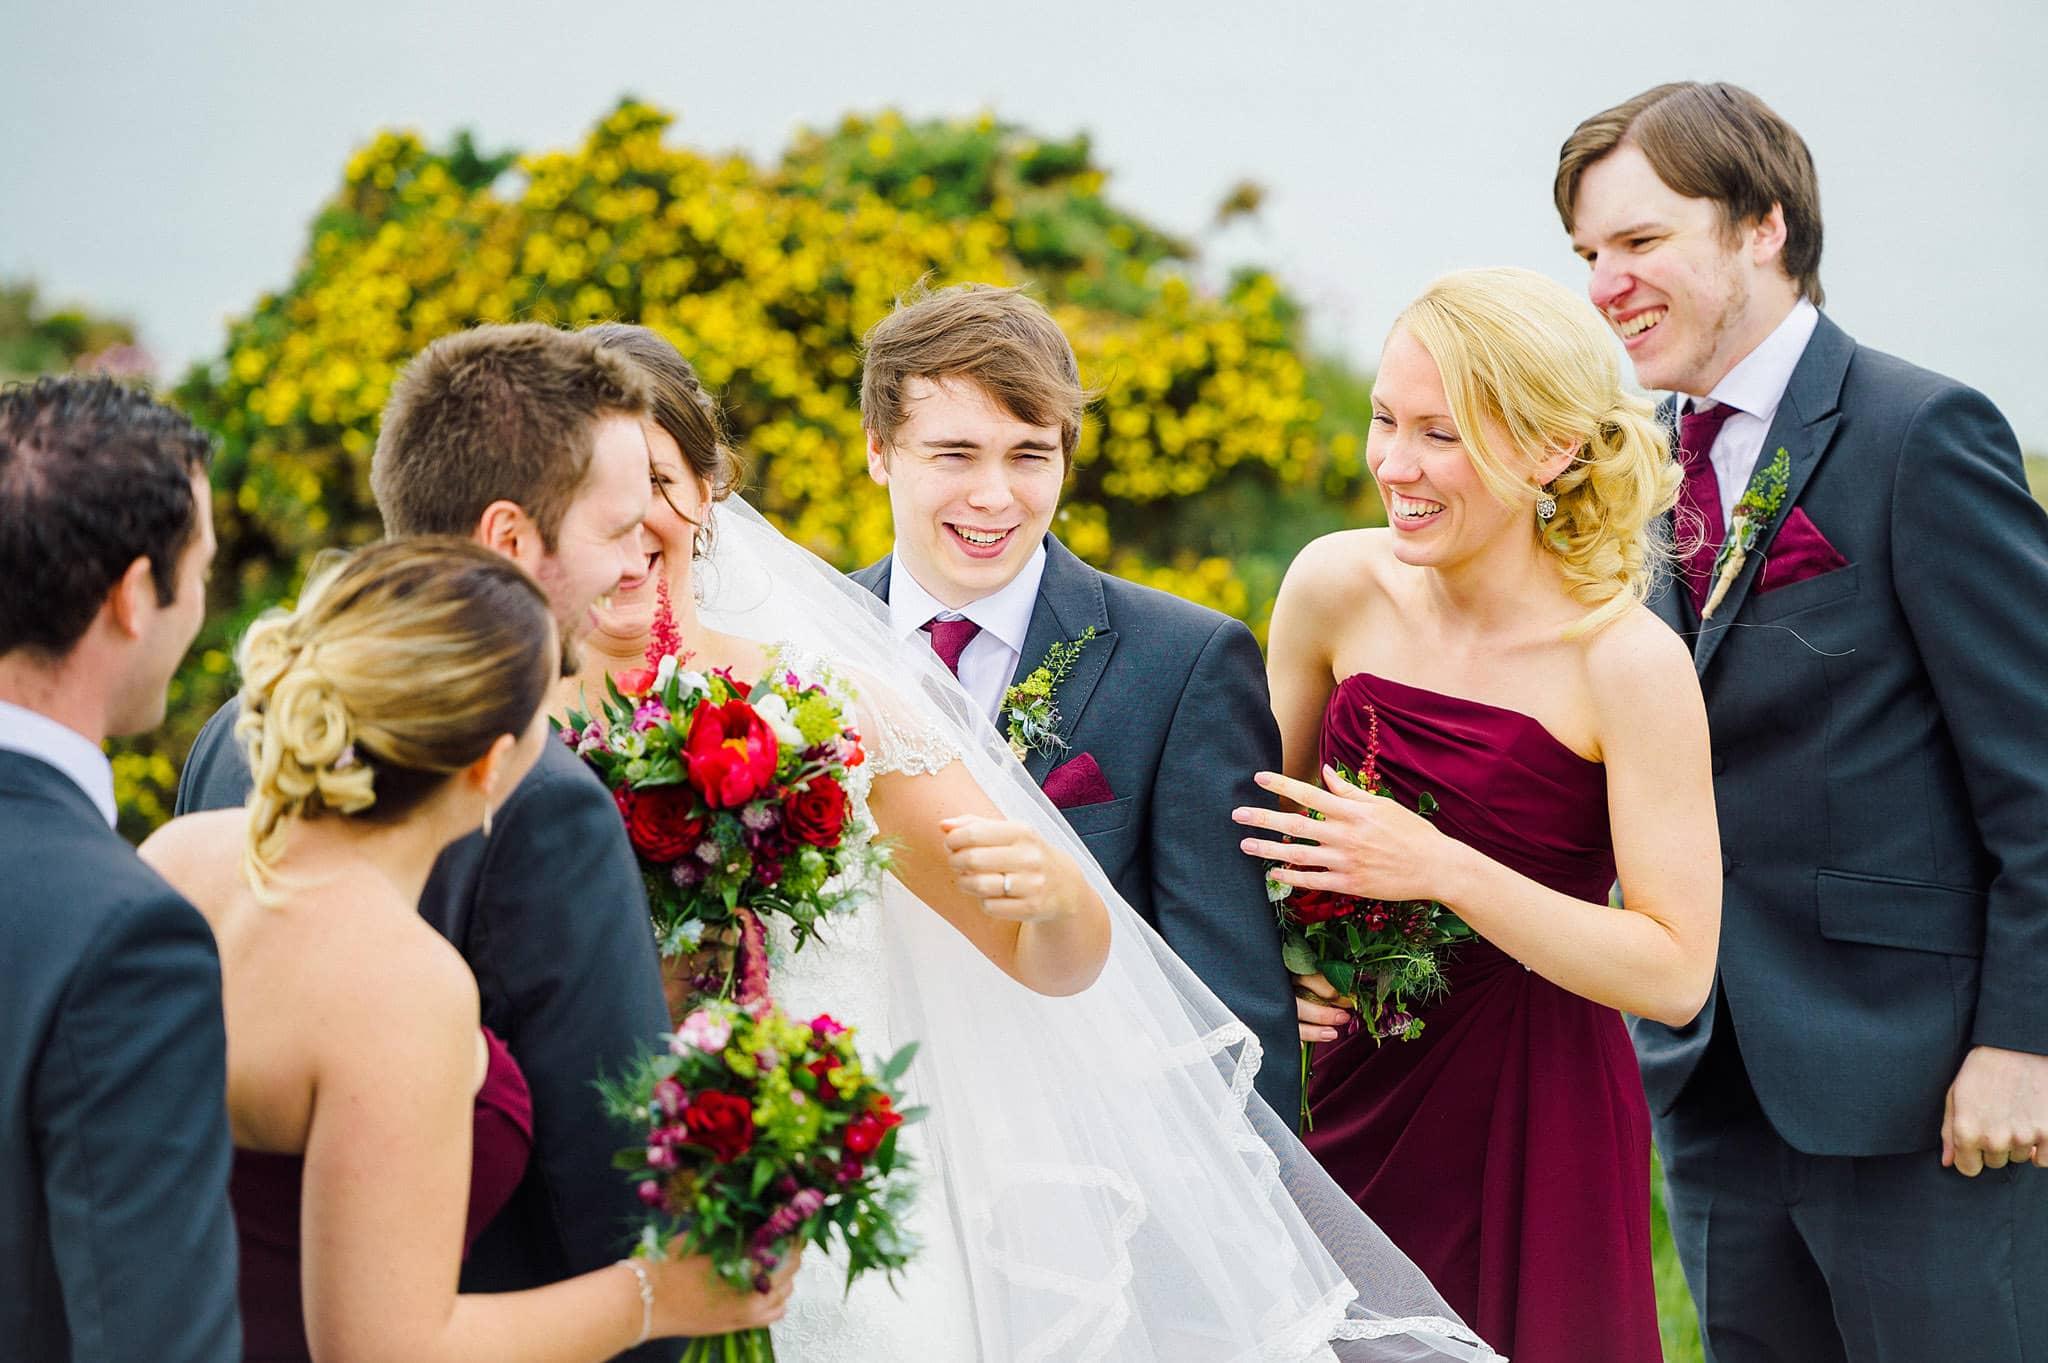 wedding-photographer-aberystwyth-wales (163)